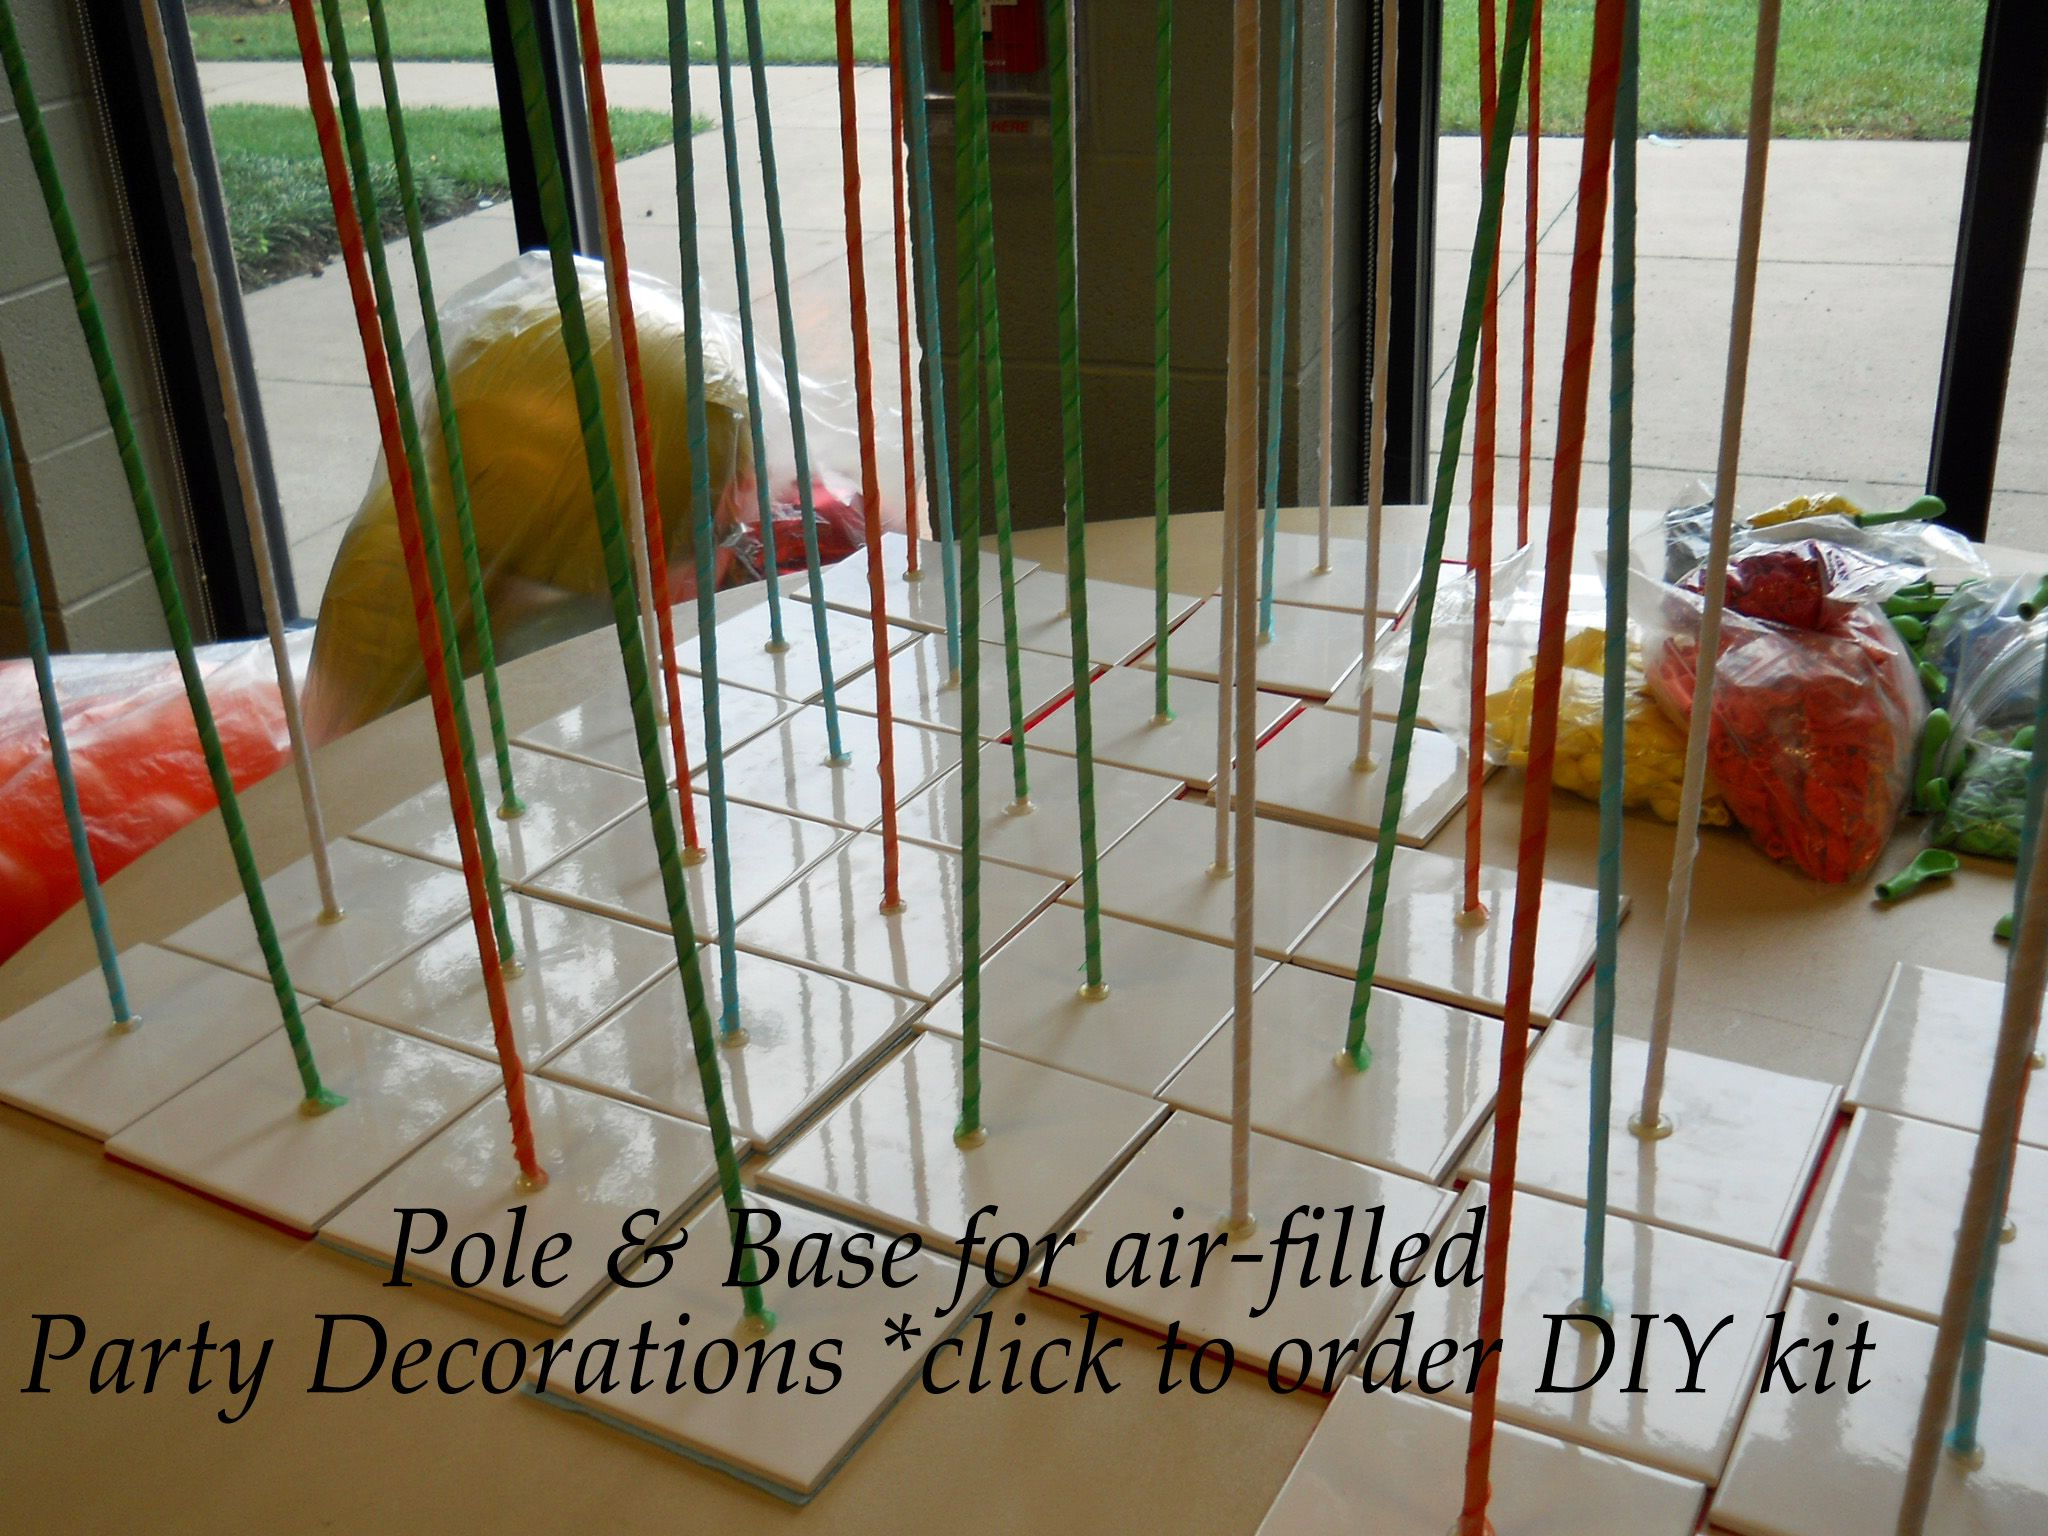 Click pin for diy pole and base kits to make balloon columns or balloon characters